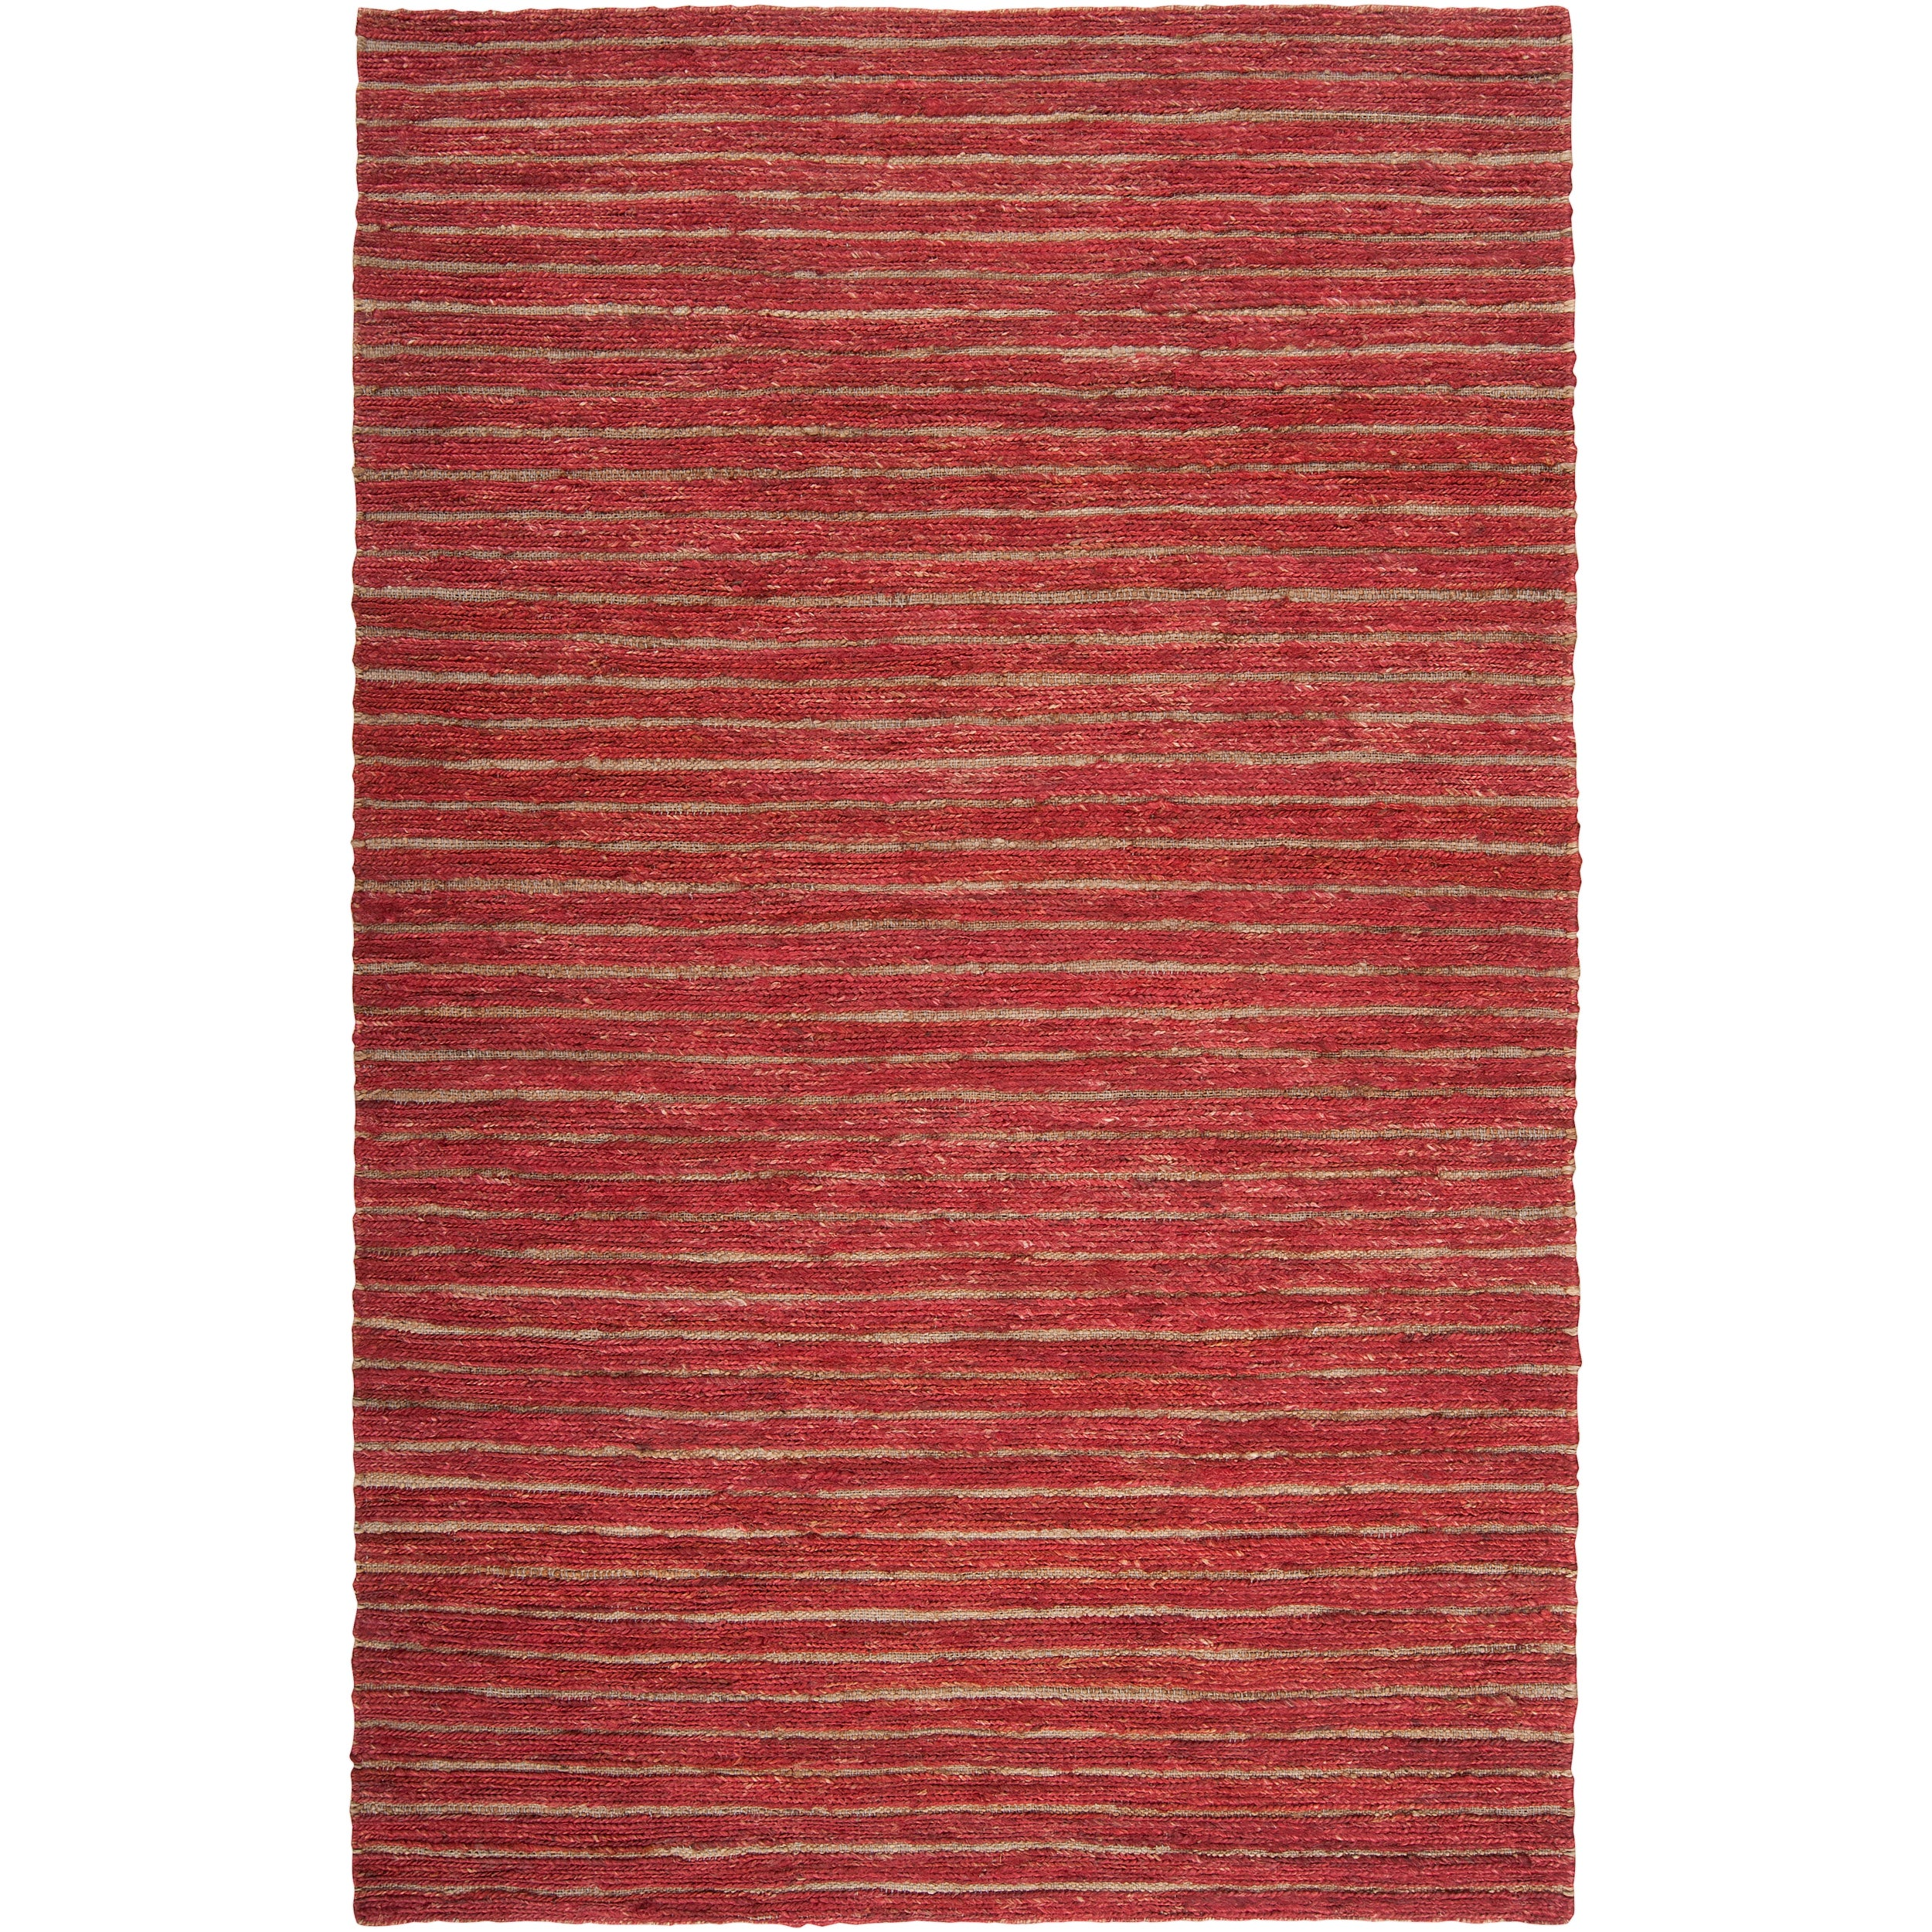 Handwoven Red Doctate Natural Fiber Transitional Hemp Rug (8' x 11')